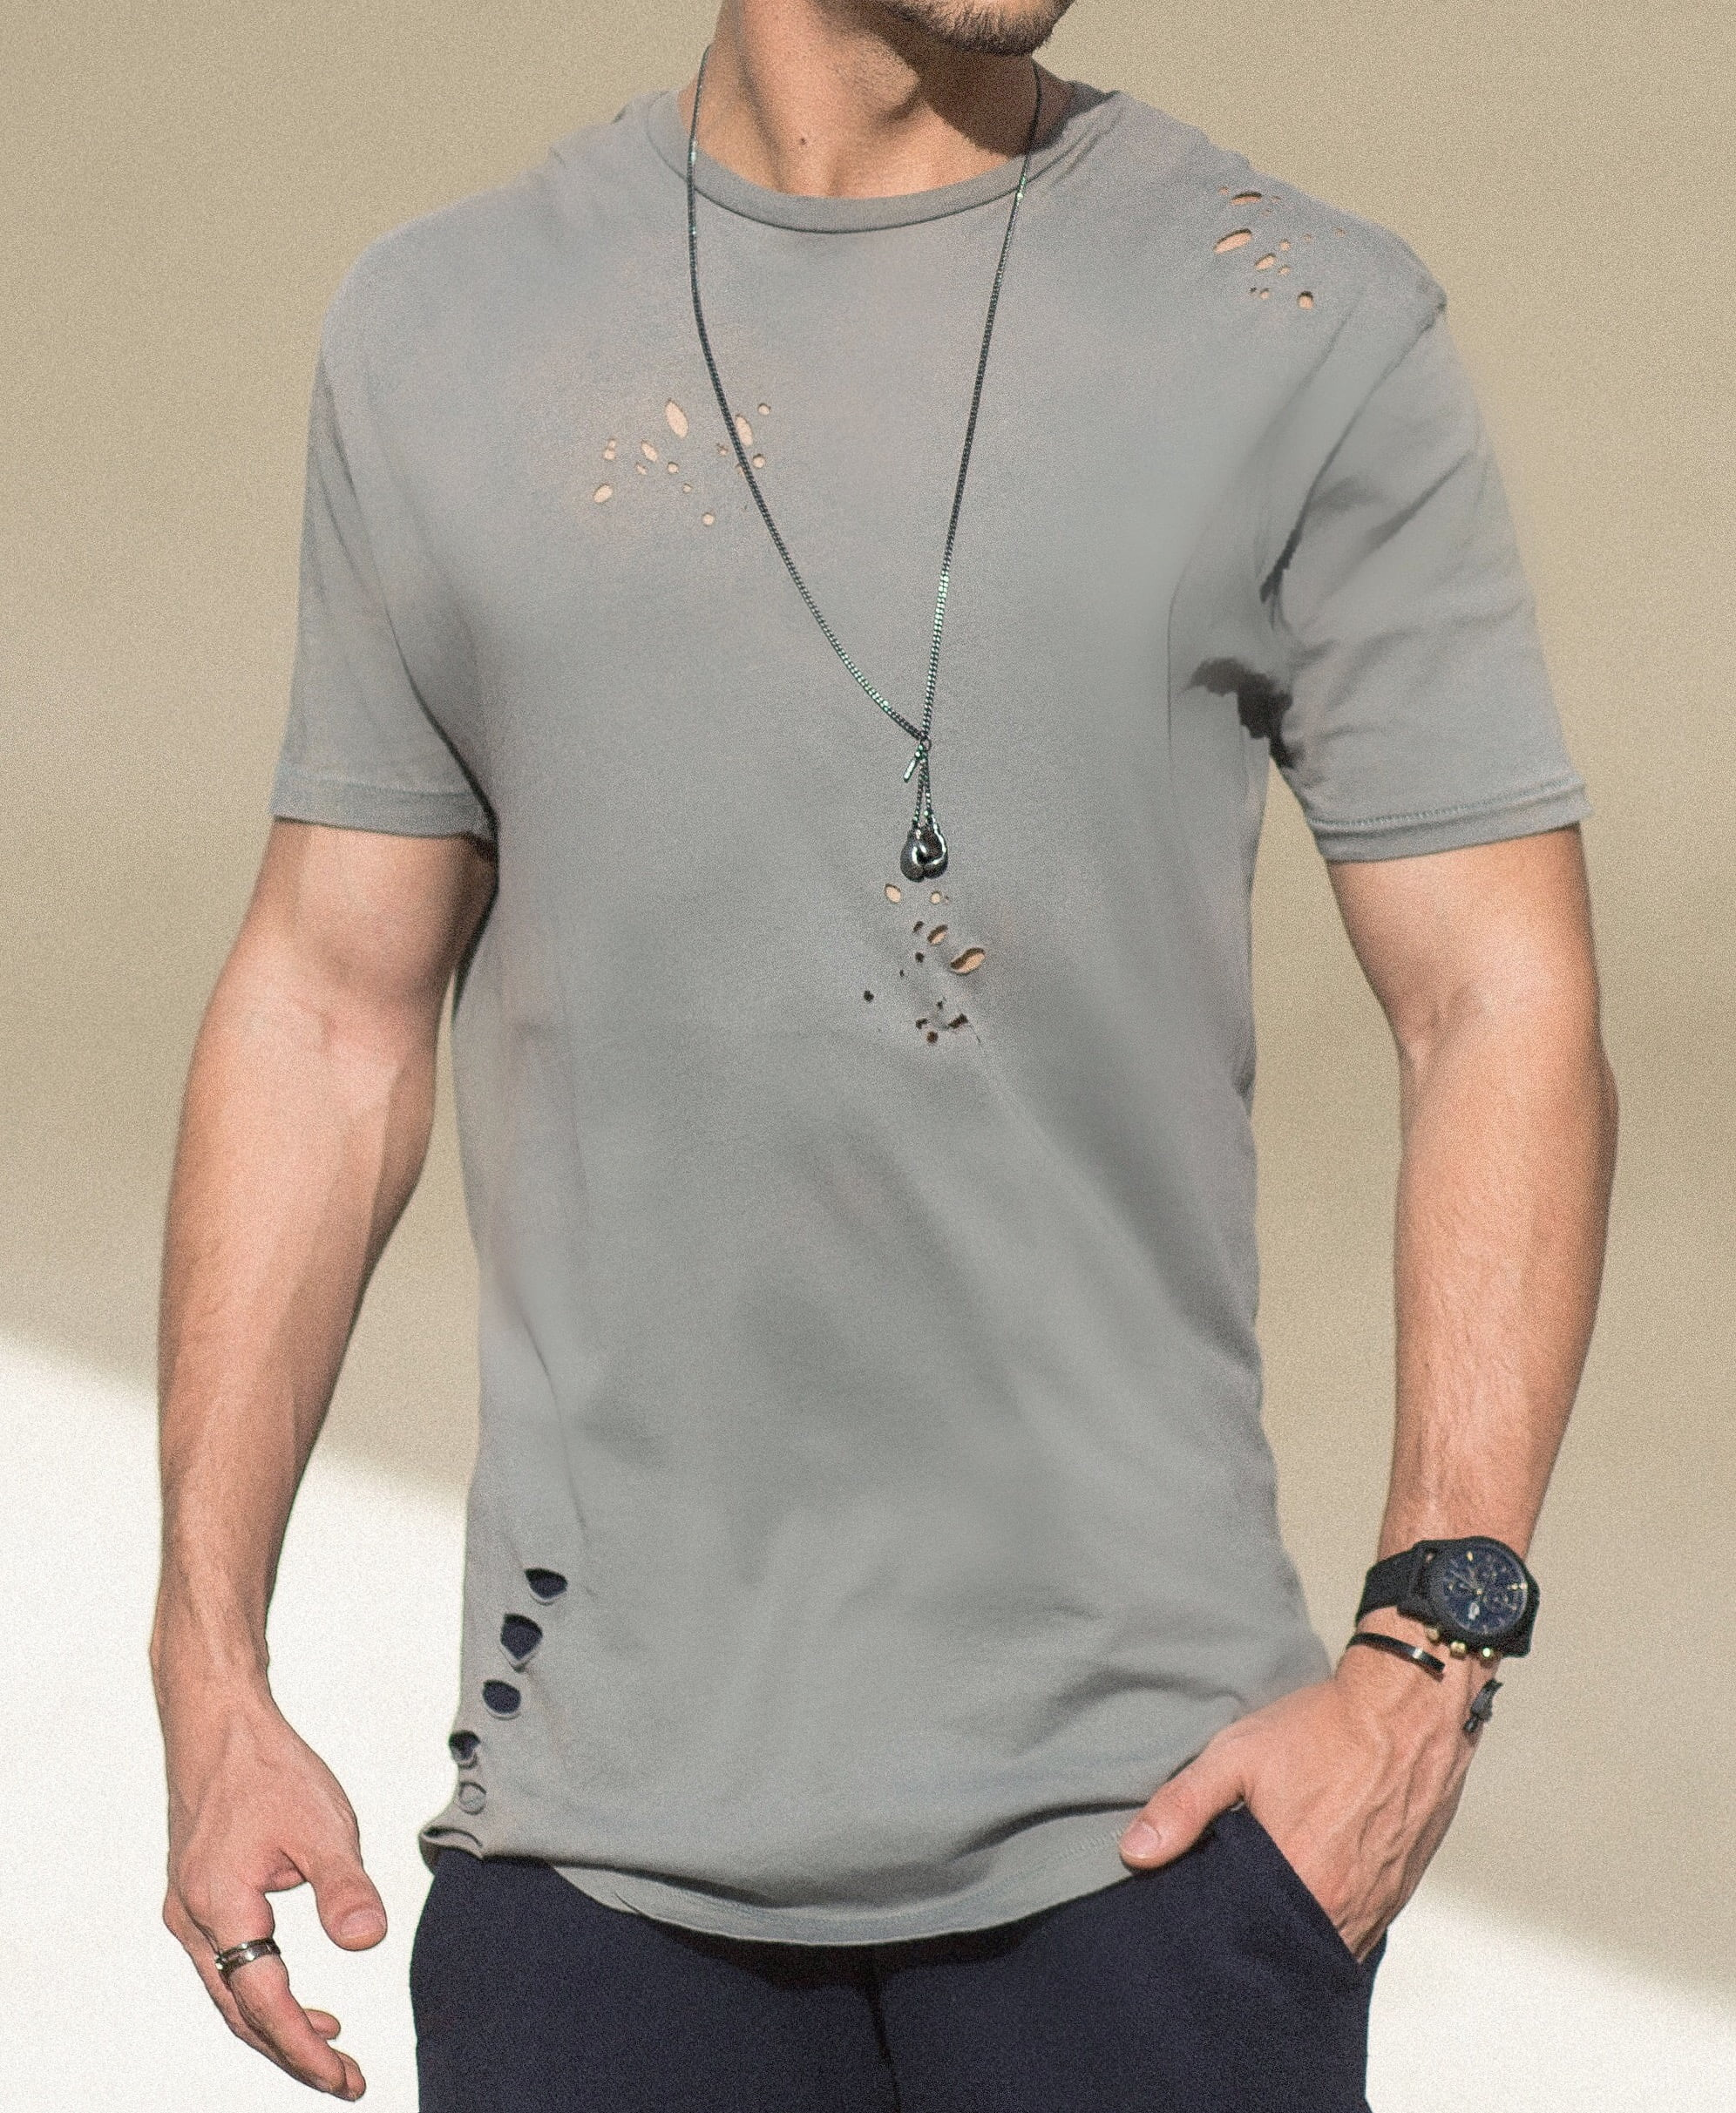 estilo-hqsc-jogger-e-camiseta-destroyed-juan-alves-b